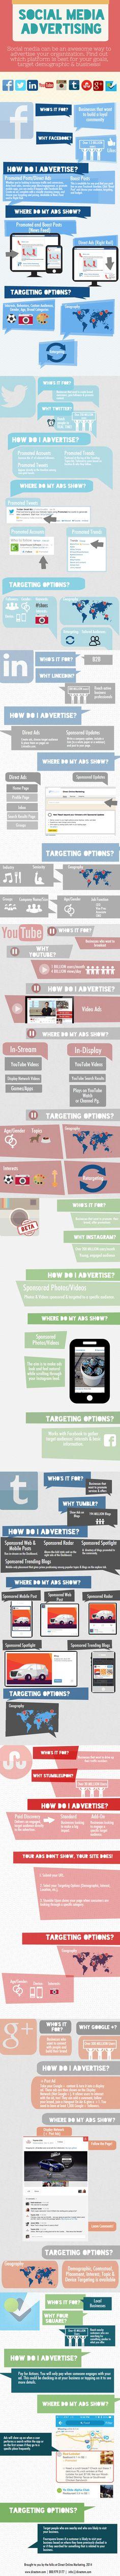 #SocialMedia Advertising Infographic